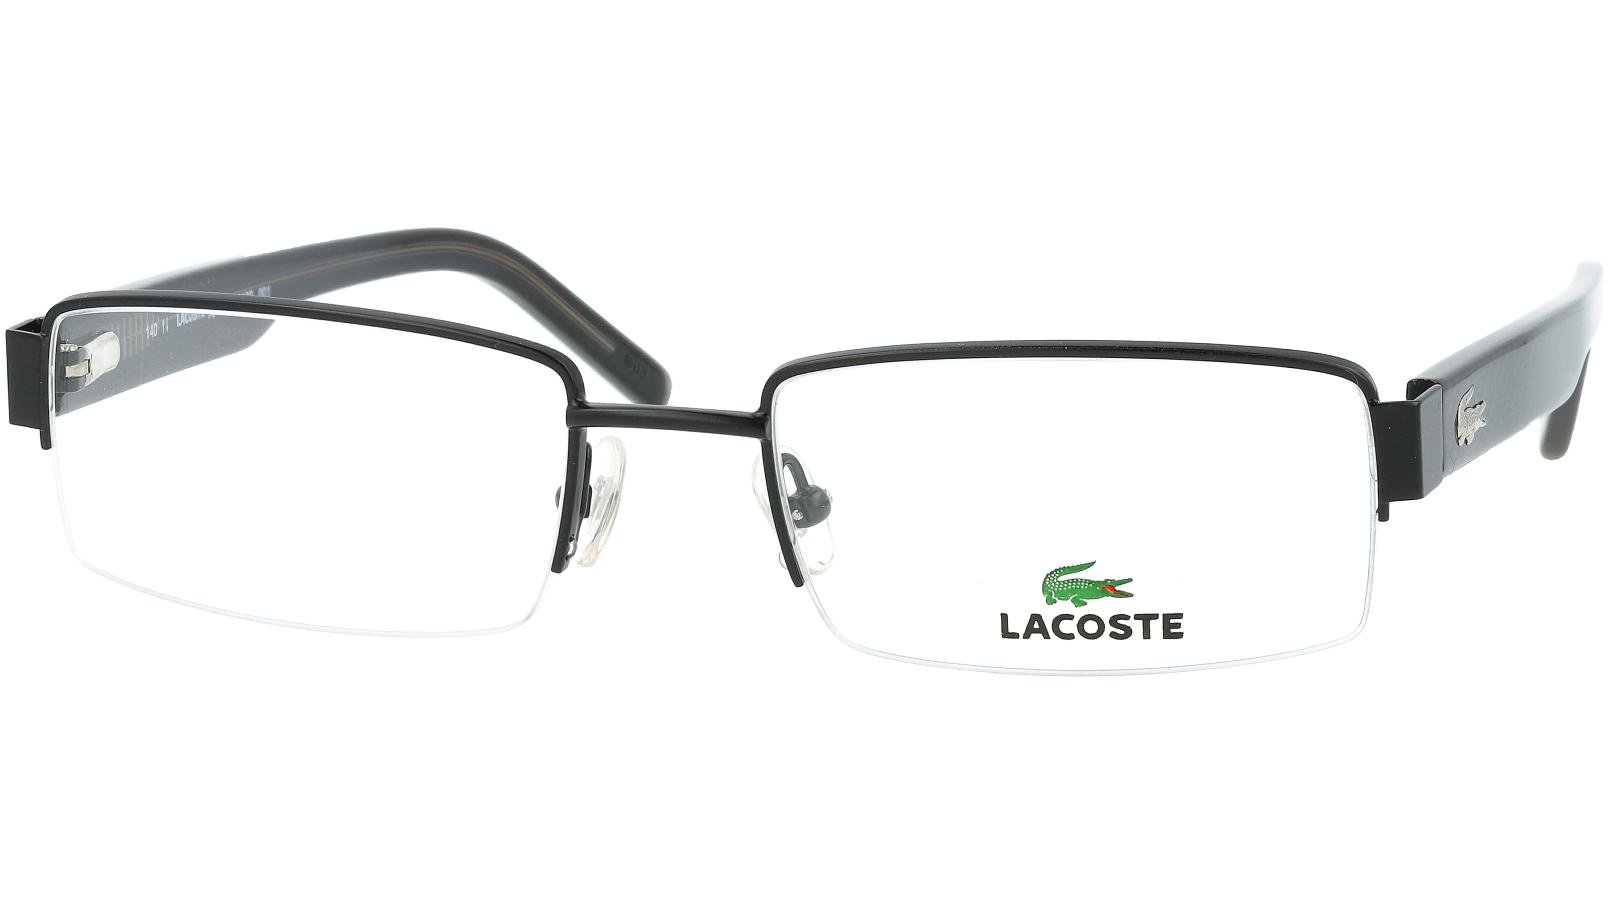 LACOSTE L2217 001 54 BLACK Glasses